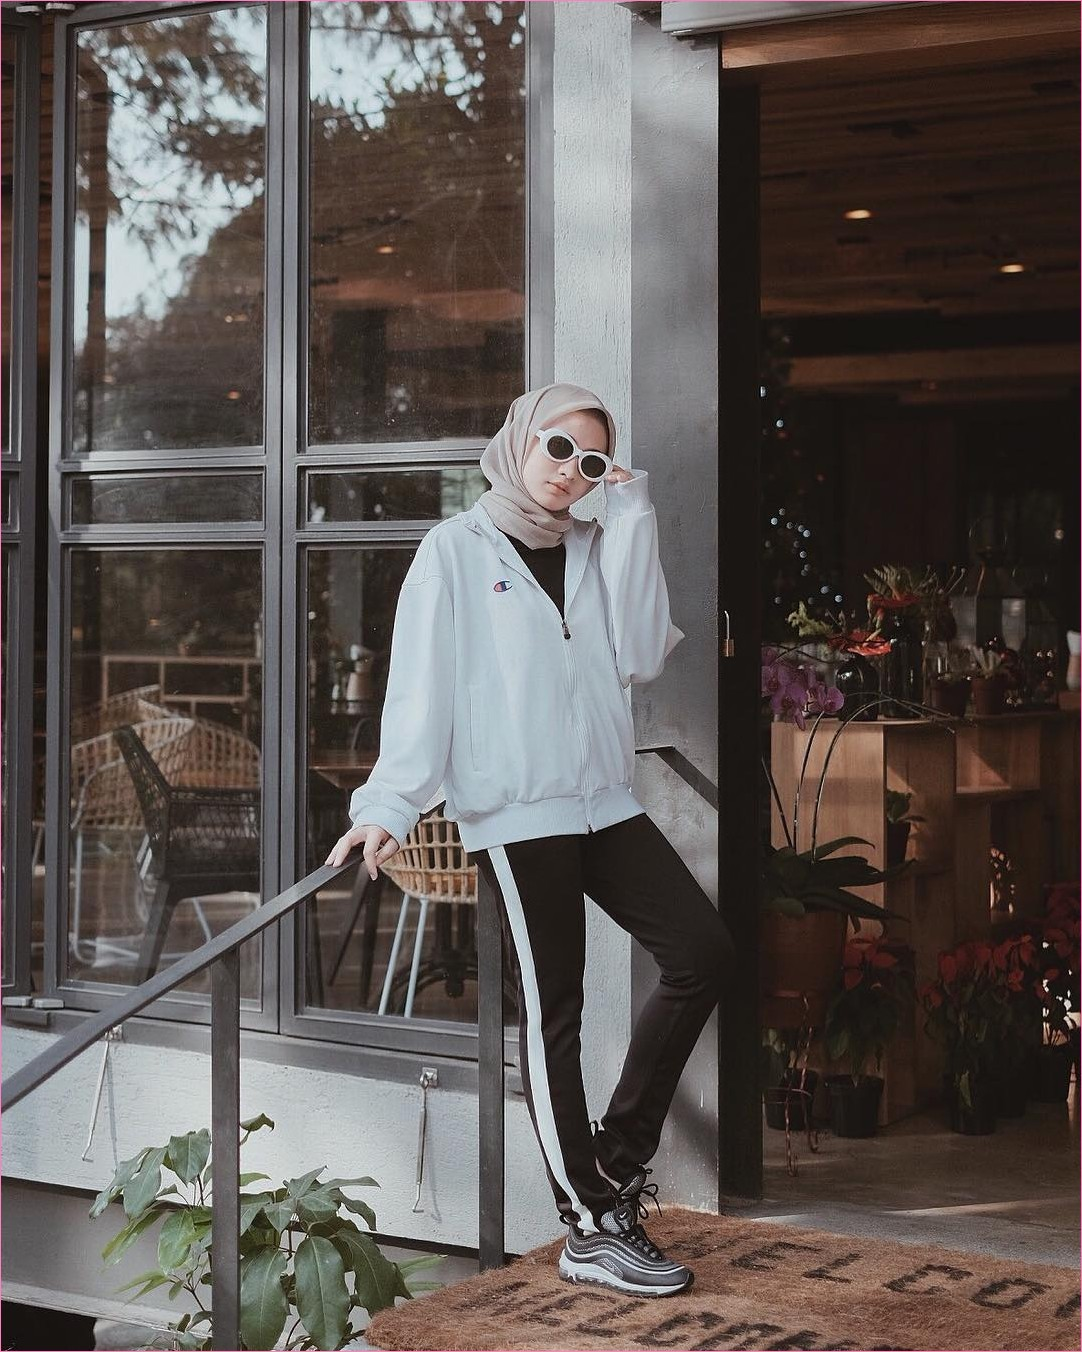 Outfit Baju Hijab Casual Untuk Olahraga Ala Selebgram 2018 celana training baju olahraga hitam sweater  abu muda sneakers kets sepatu olahraga hijab segiempat polos coklat muda gaya casual kain katun rayon ootd outfit jogging 2018 selebgram kaca bunga kursi keset daun kacamata